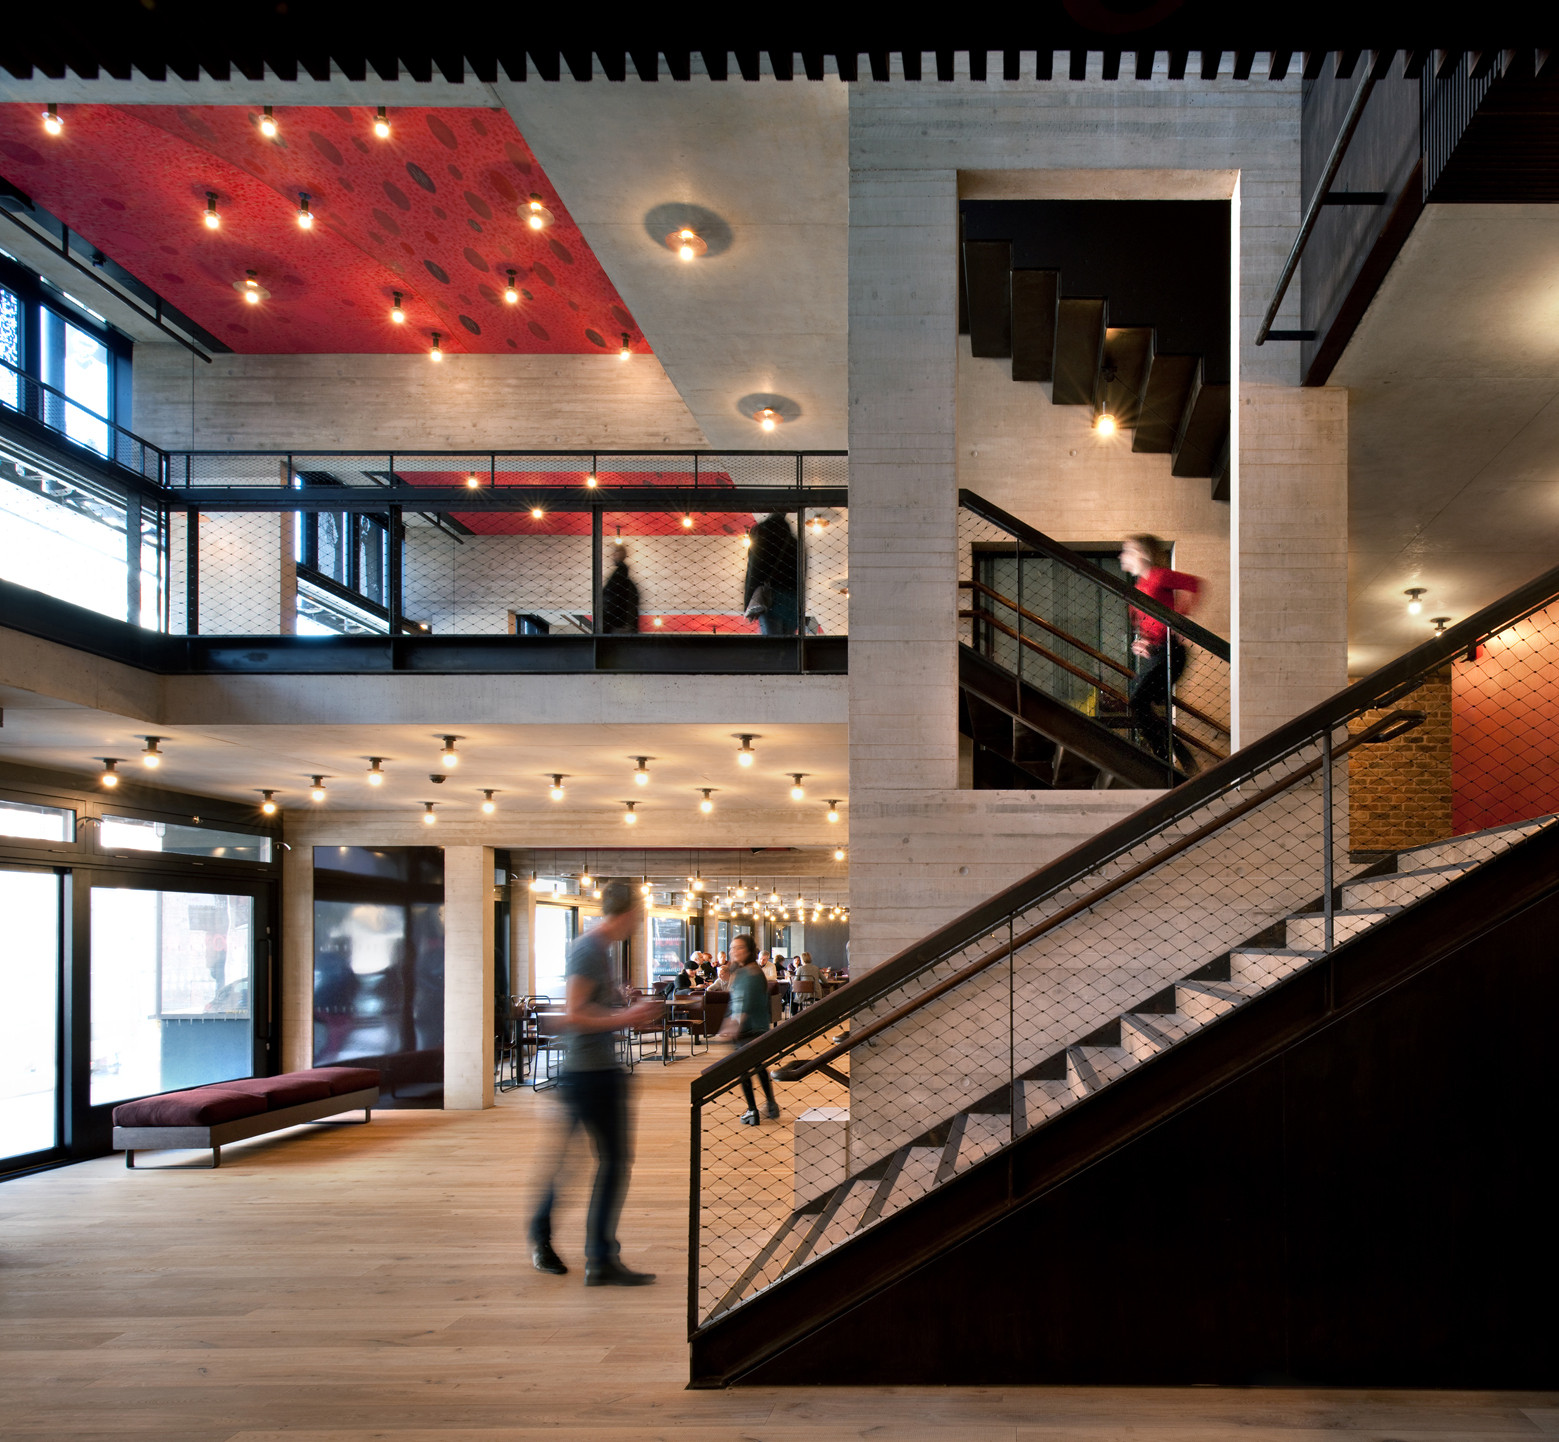 Teatro Everyman / Haworth Tompkins. Imágen © Philip Vile